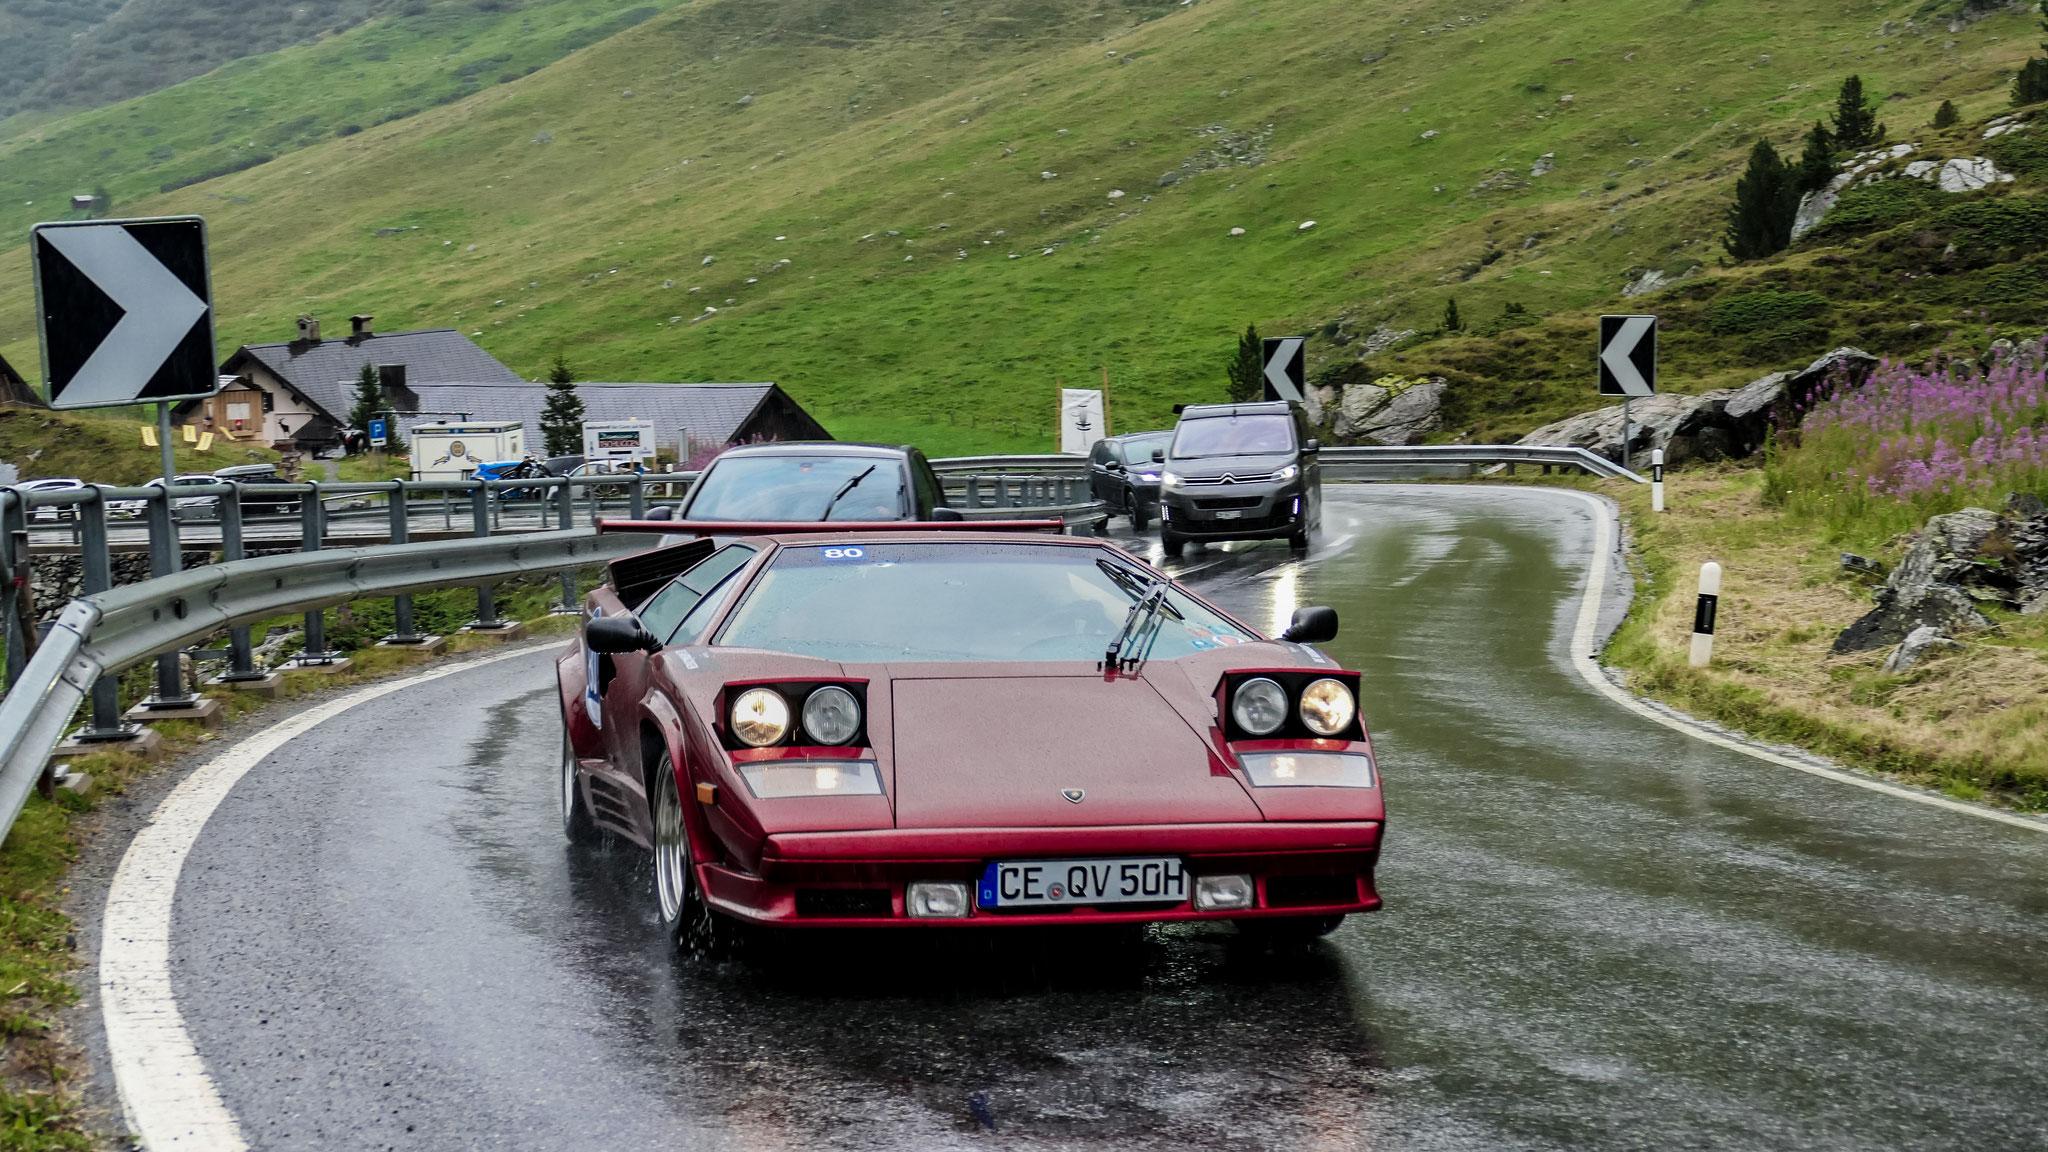 Lamborghini  Countach - CE-QV-50H